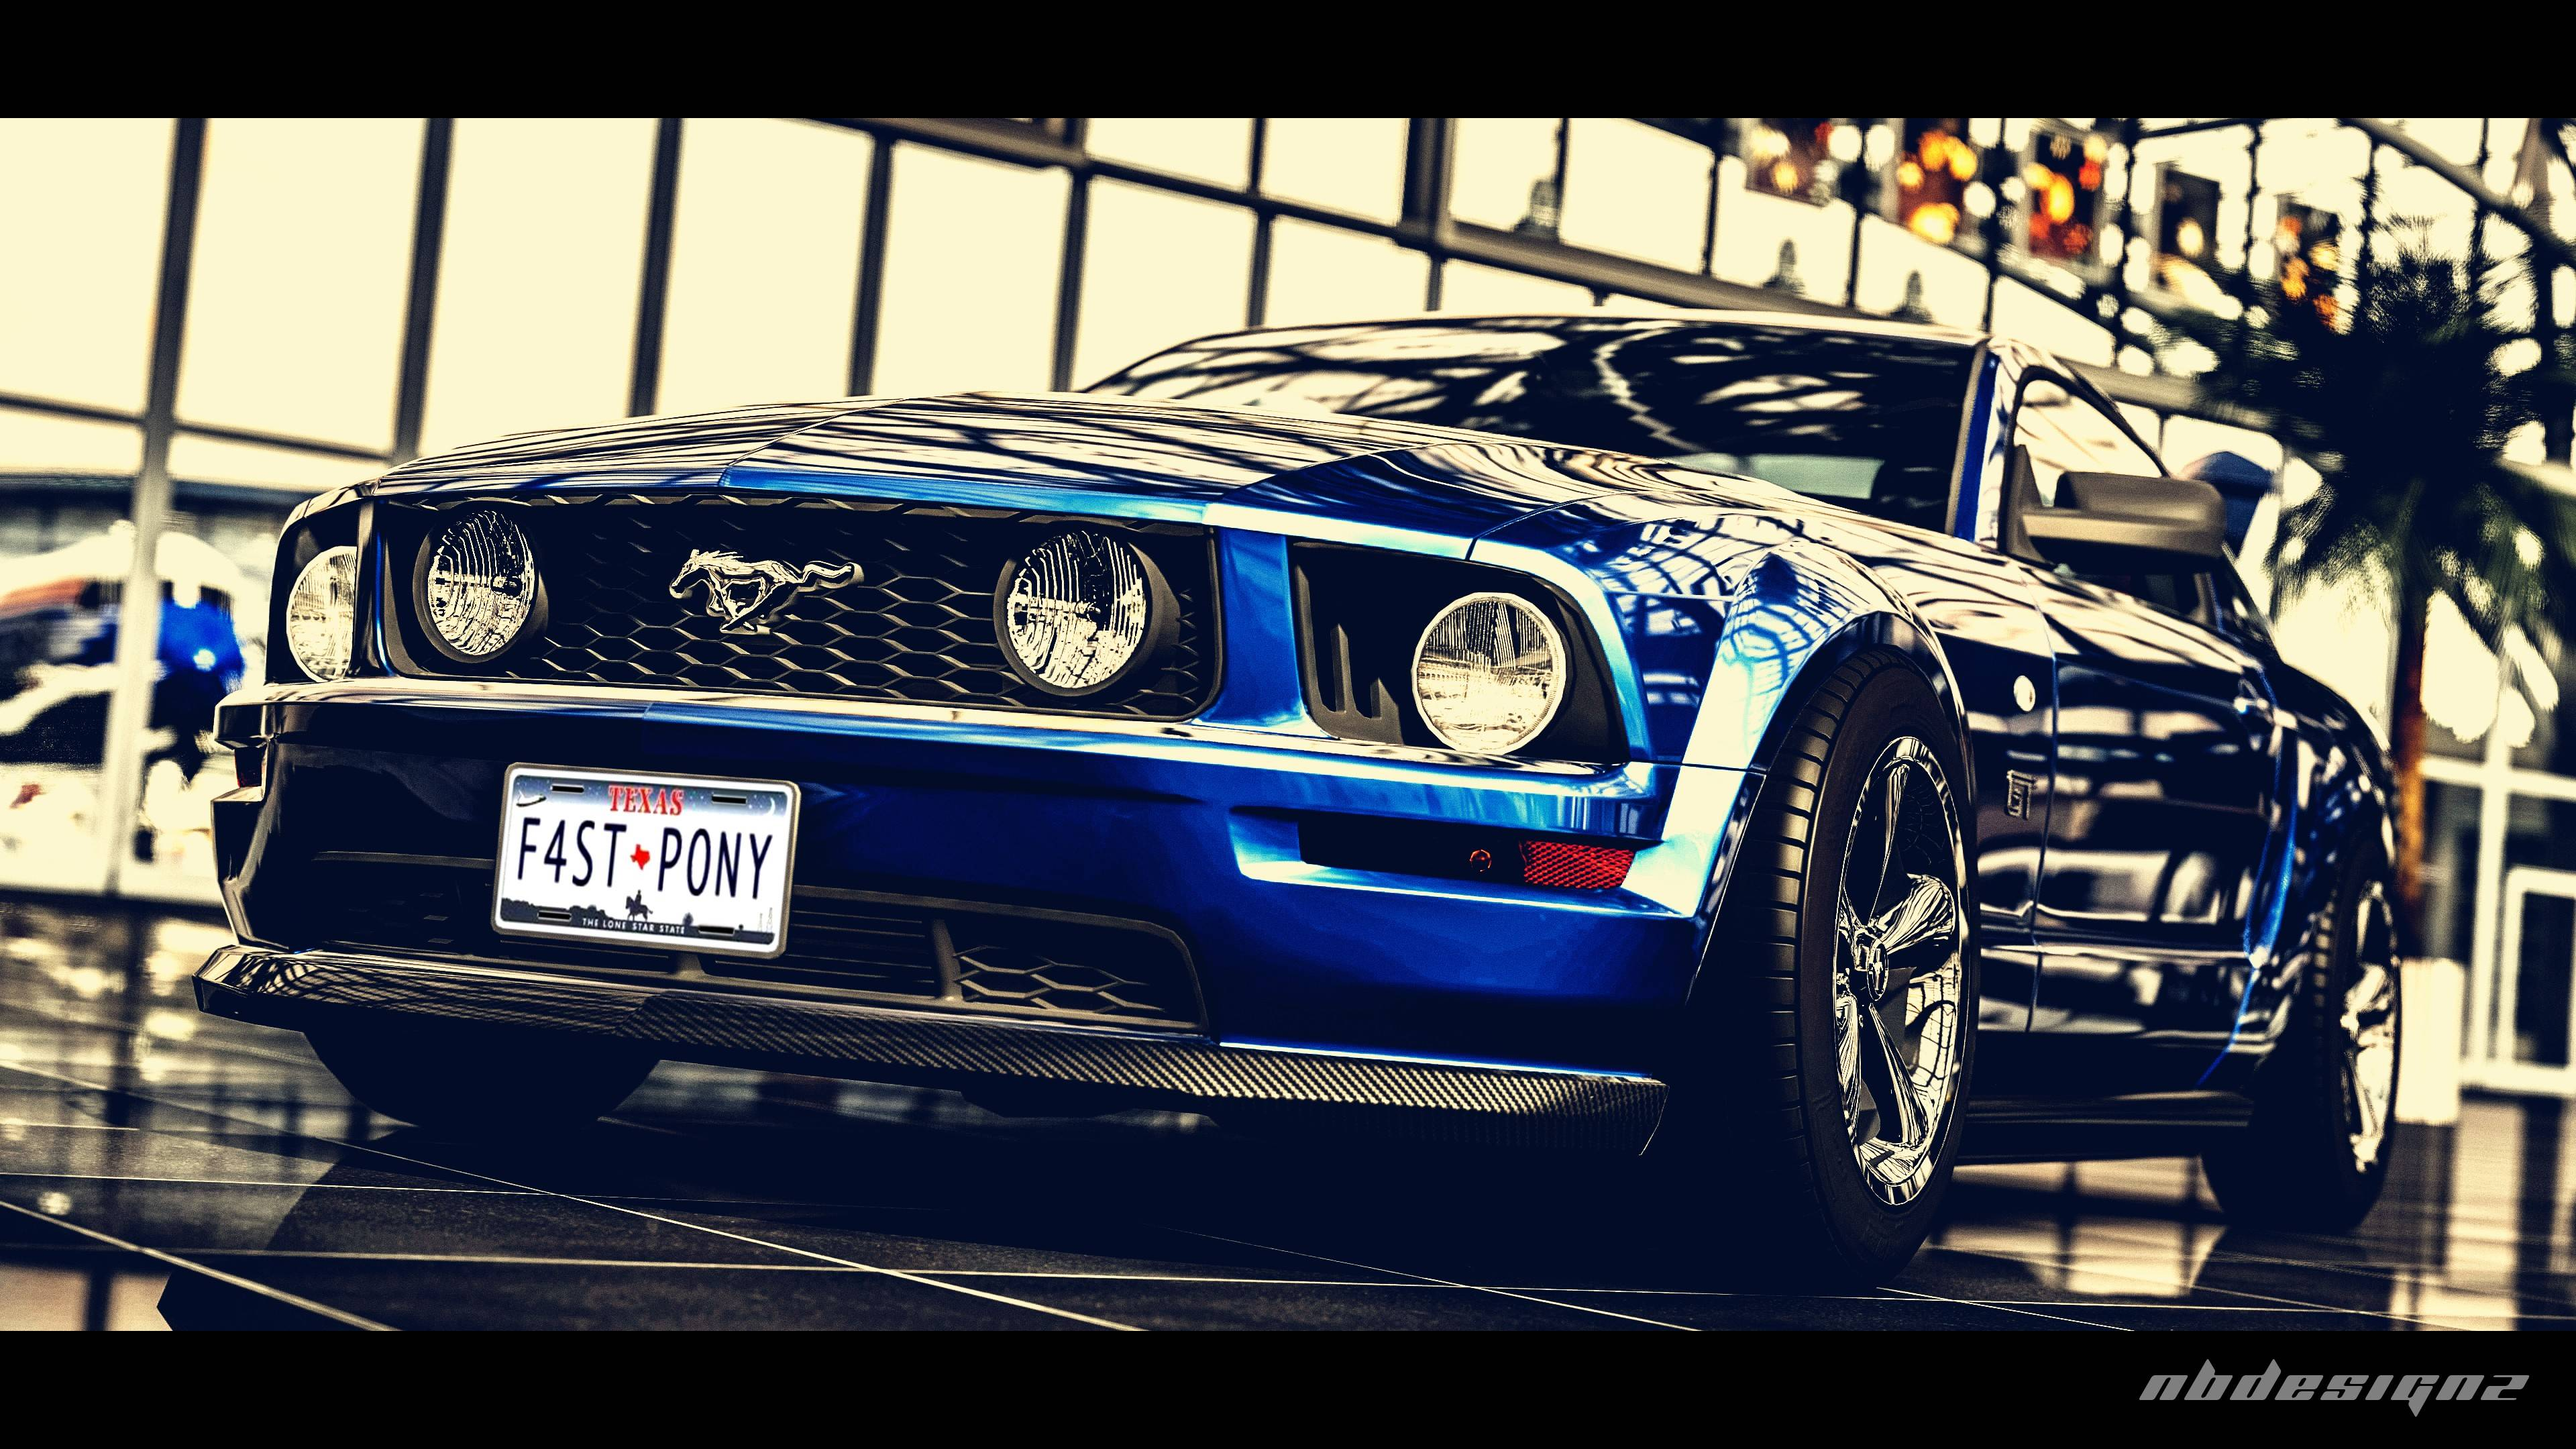 Ford Mustang wallpaper | Ford Mustang wallpaper - Part 9